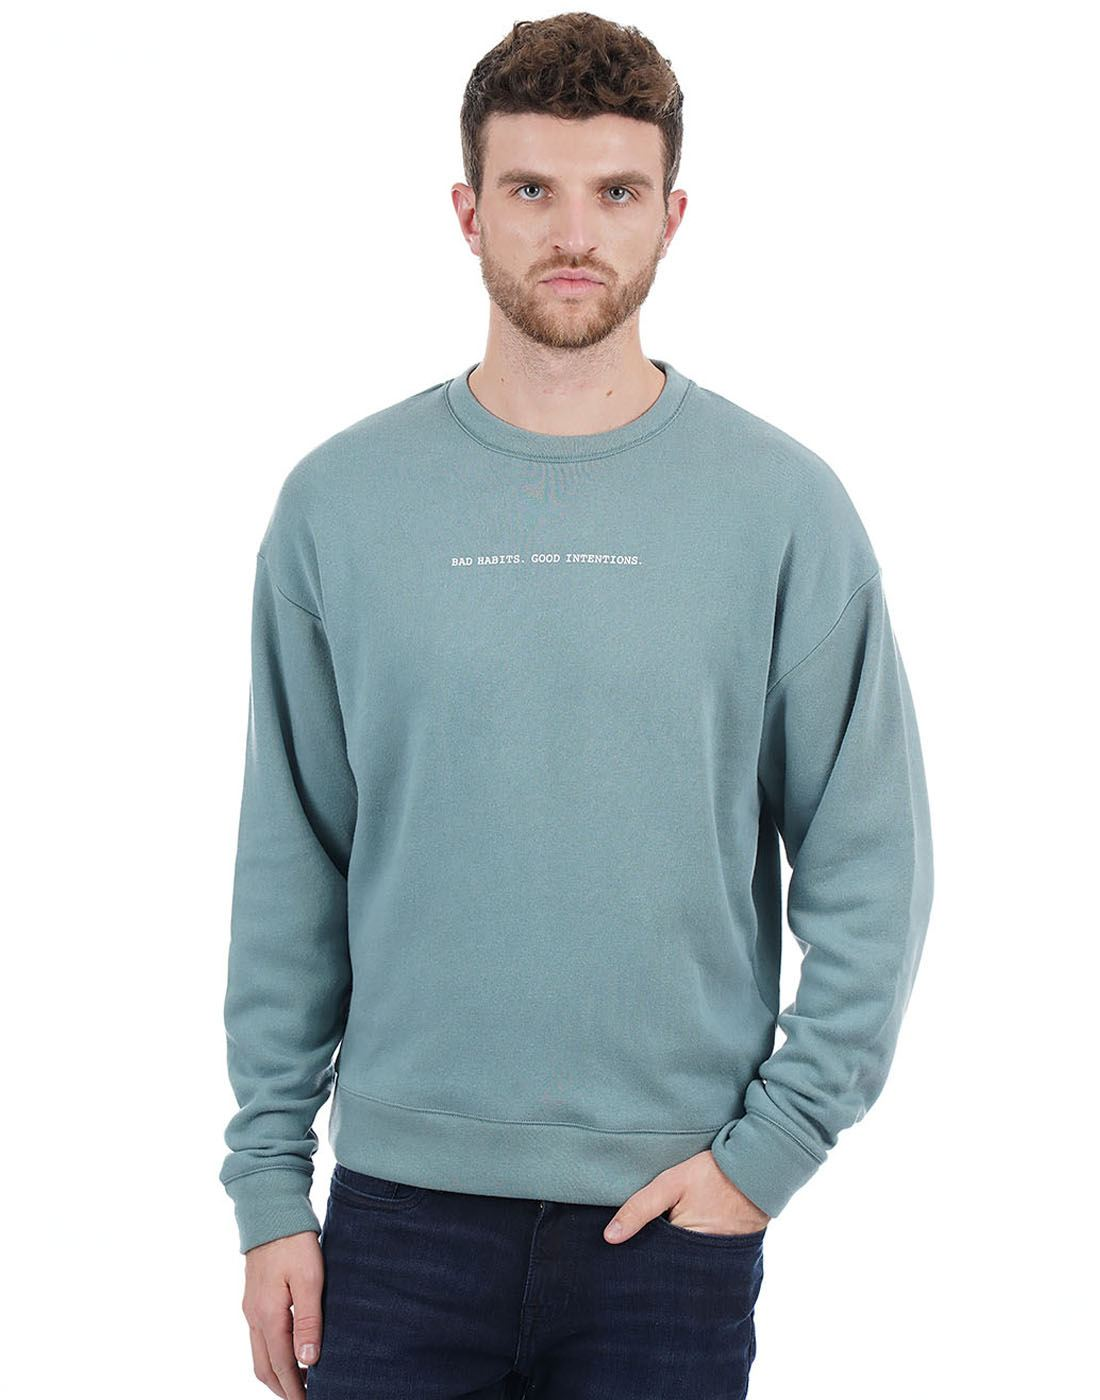 Aeropostale Men Green Sweat Shirt